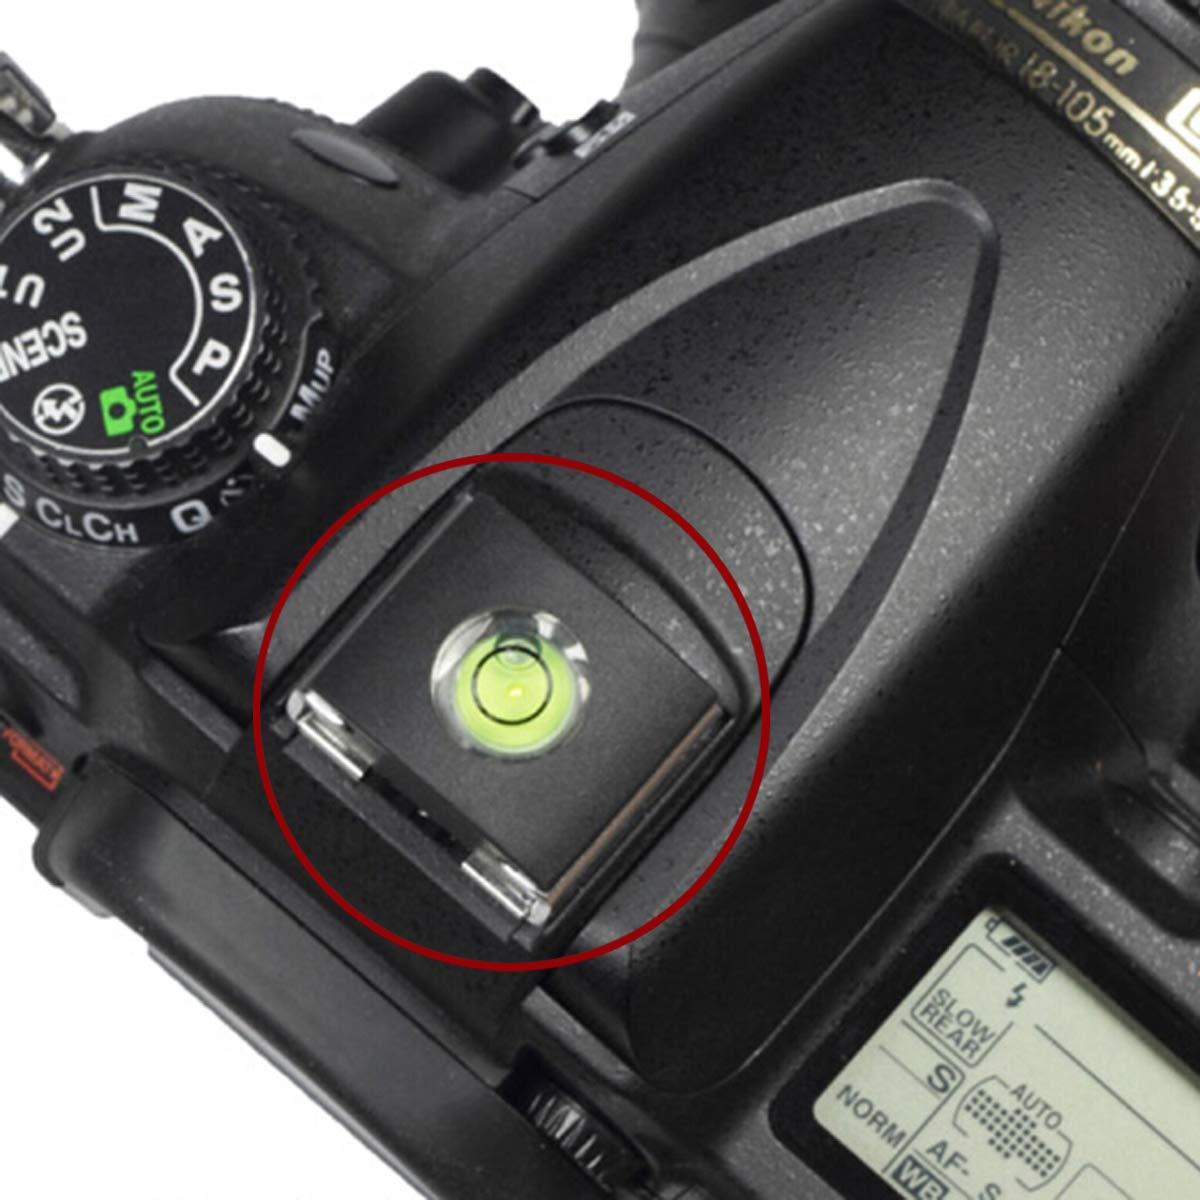 Protector de pantalla para cámaras Nikon D3400 D3300 D3200, debous ...